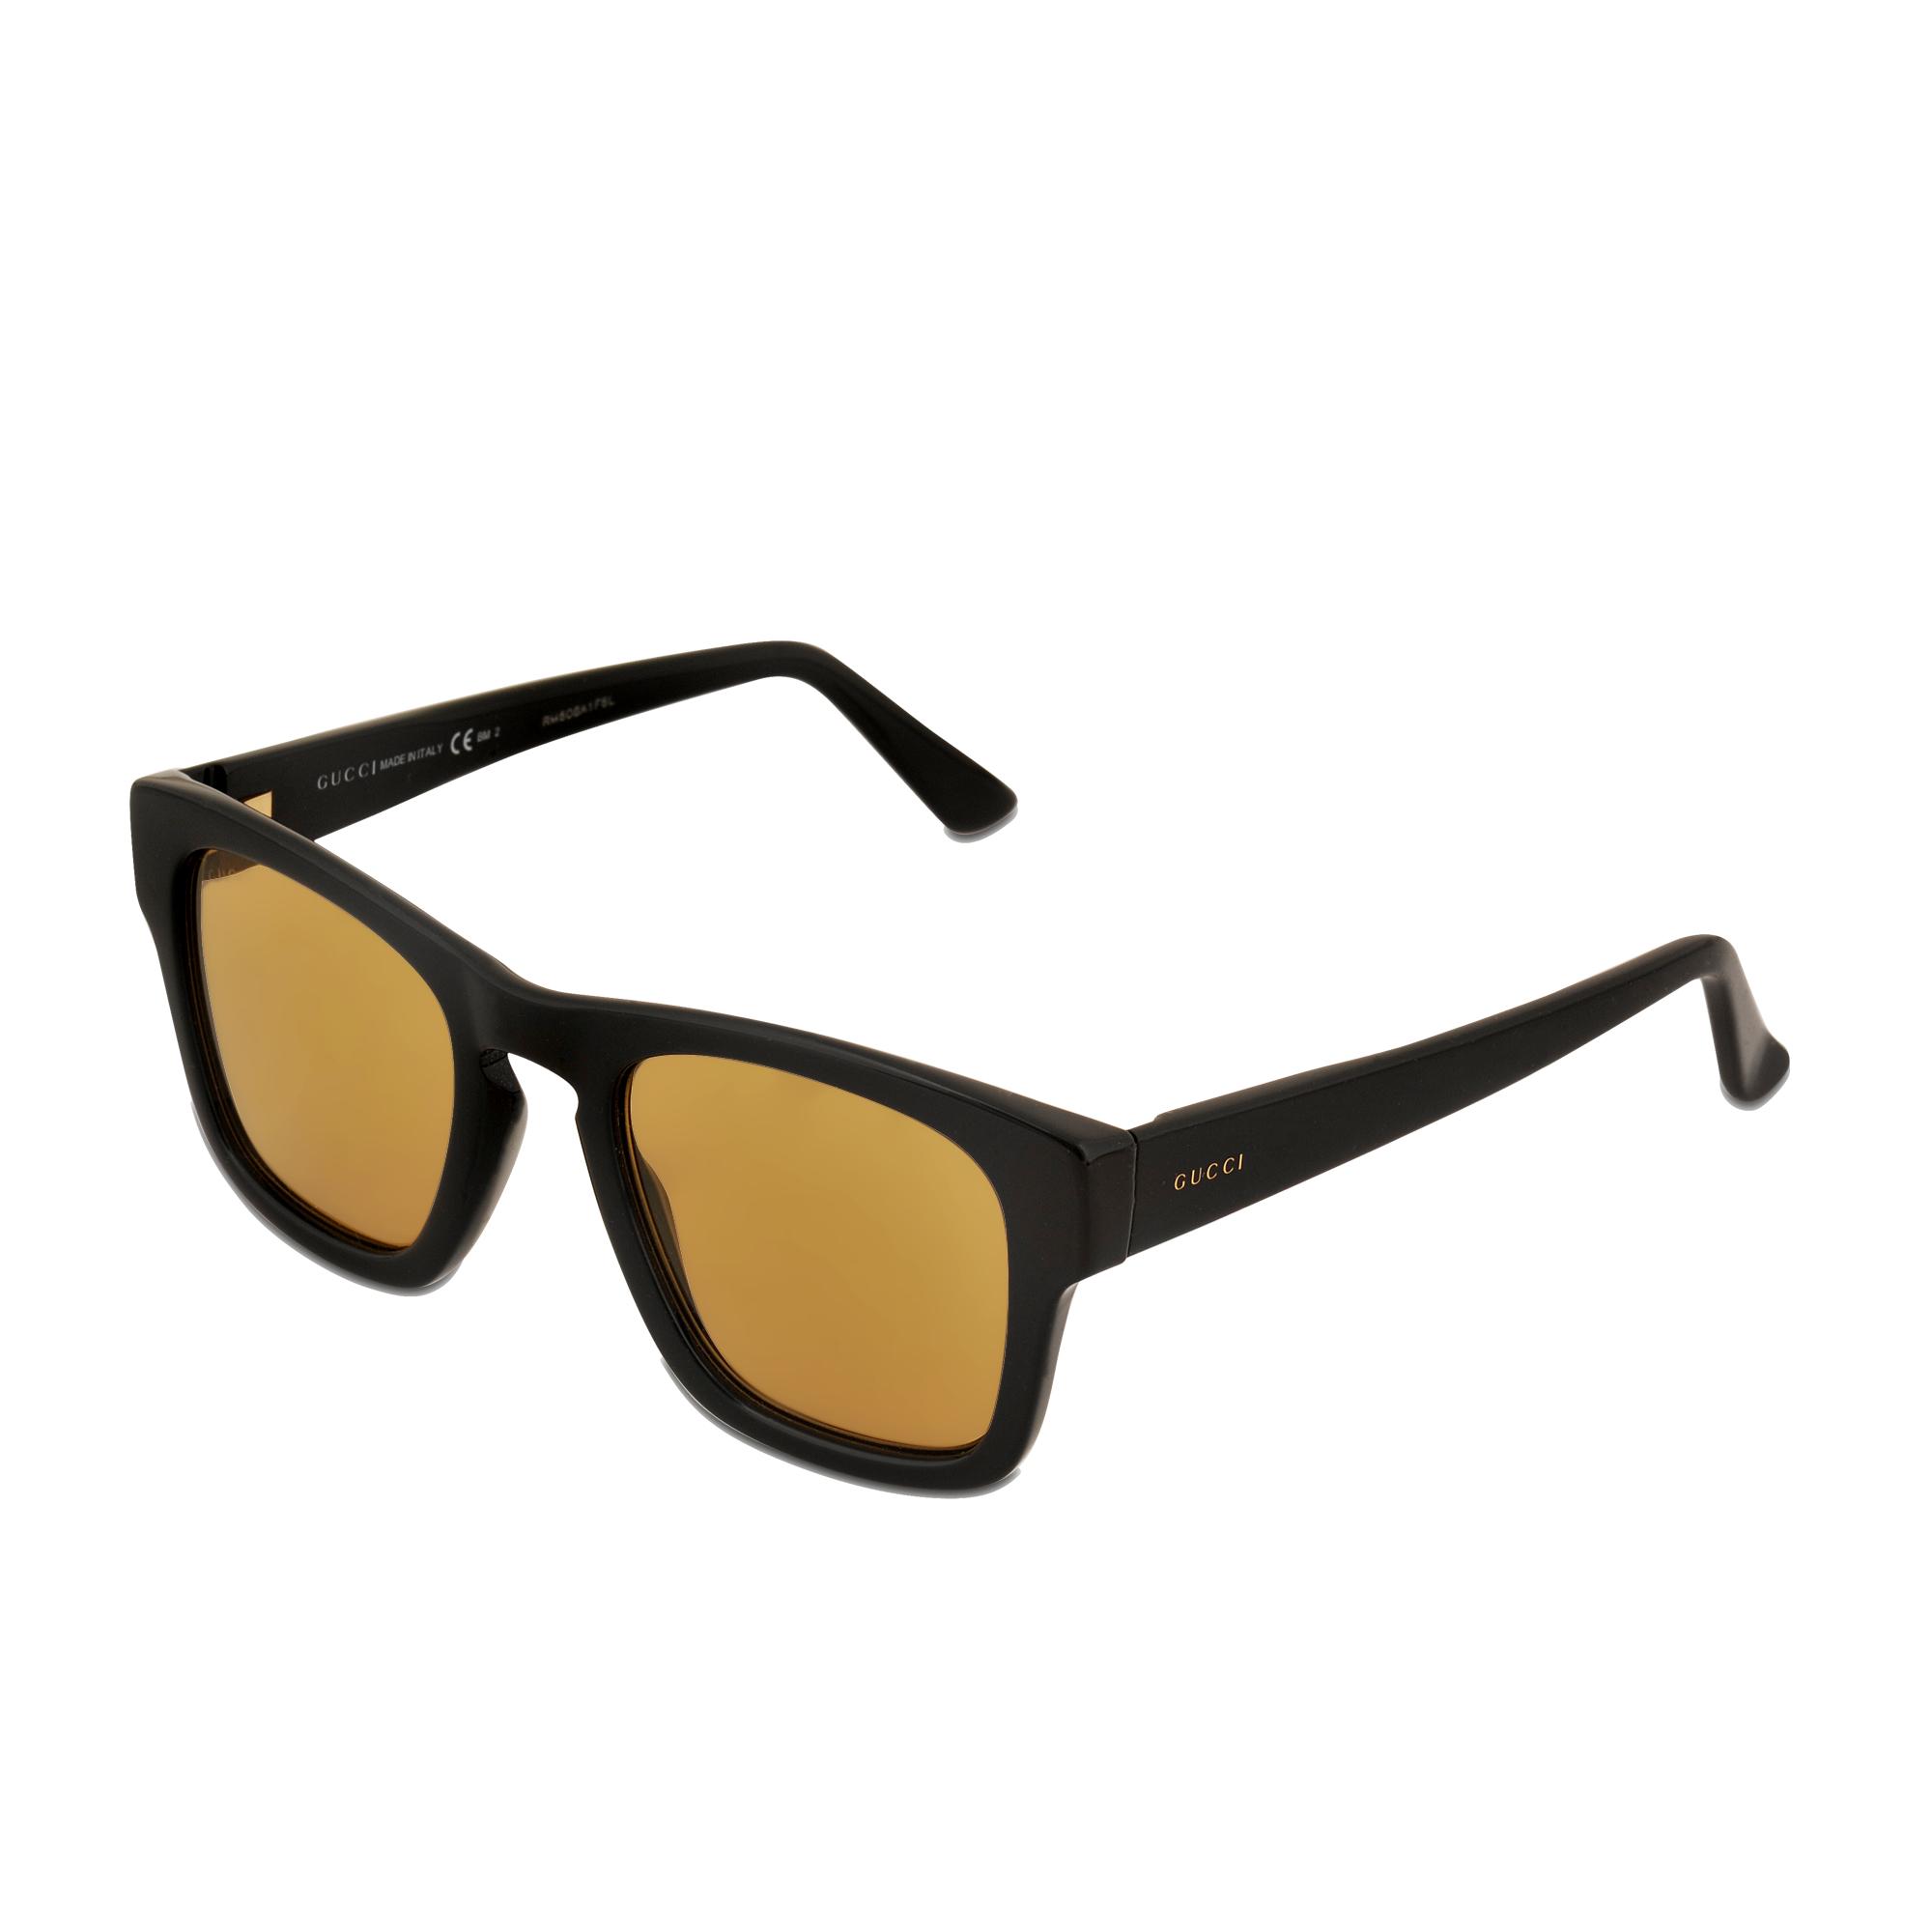 916d7c542c5 Lyst - Gucci Gg 3791 s Sunglasses in Black